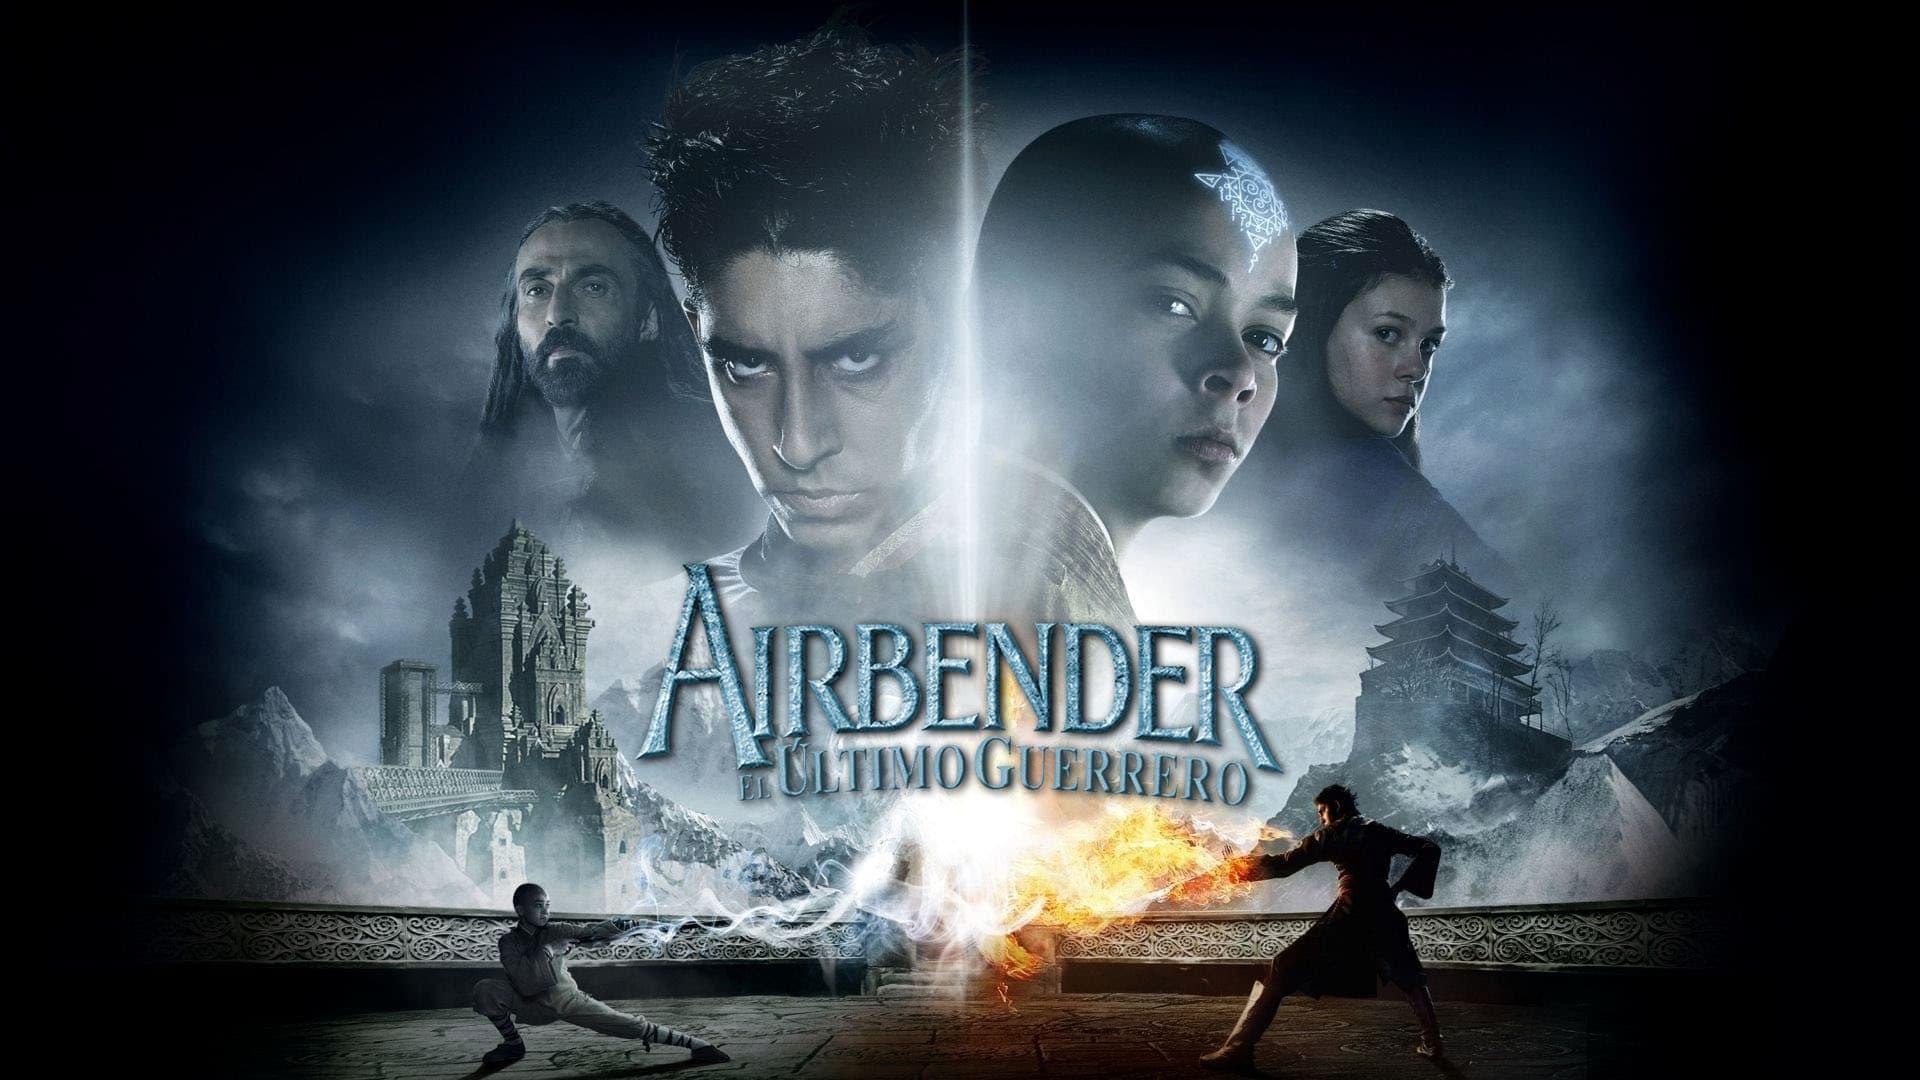 Watch Streaming The Last Airbender (2010) Online Movie at ... The Last Airbender 2 Movie Go Stream